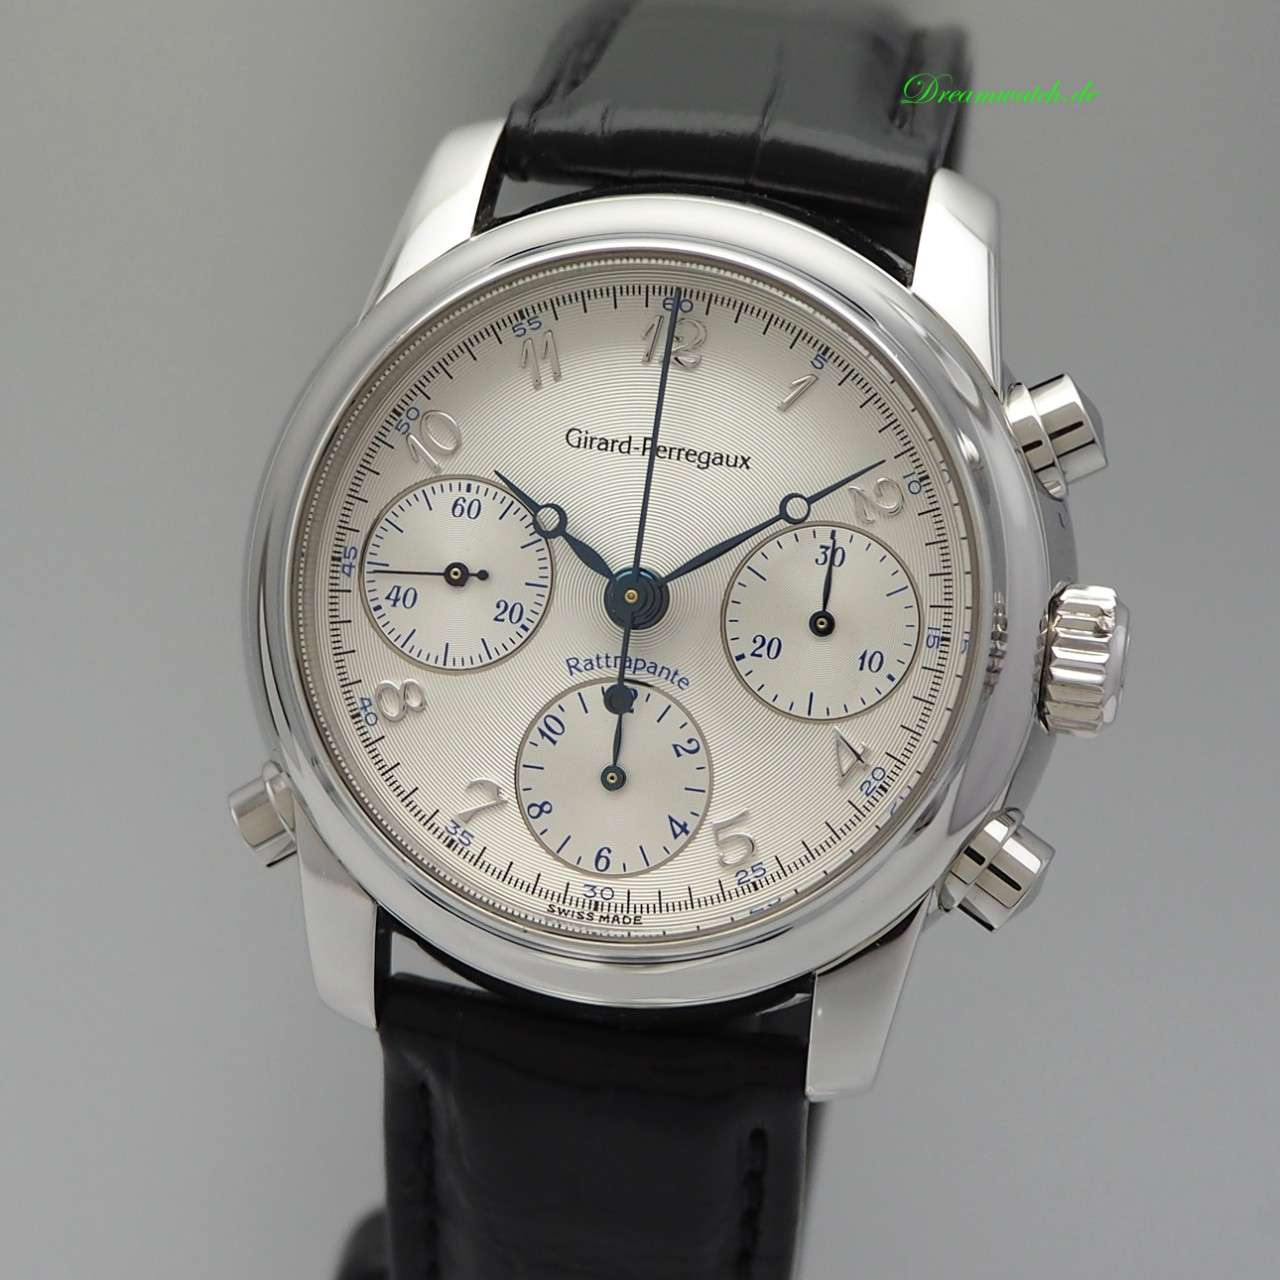 Girard Perregaux Rattrapante Chronograph Ref.: 9010